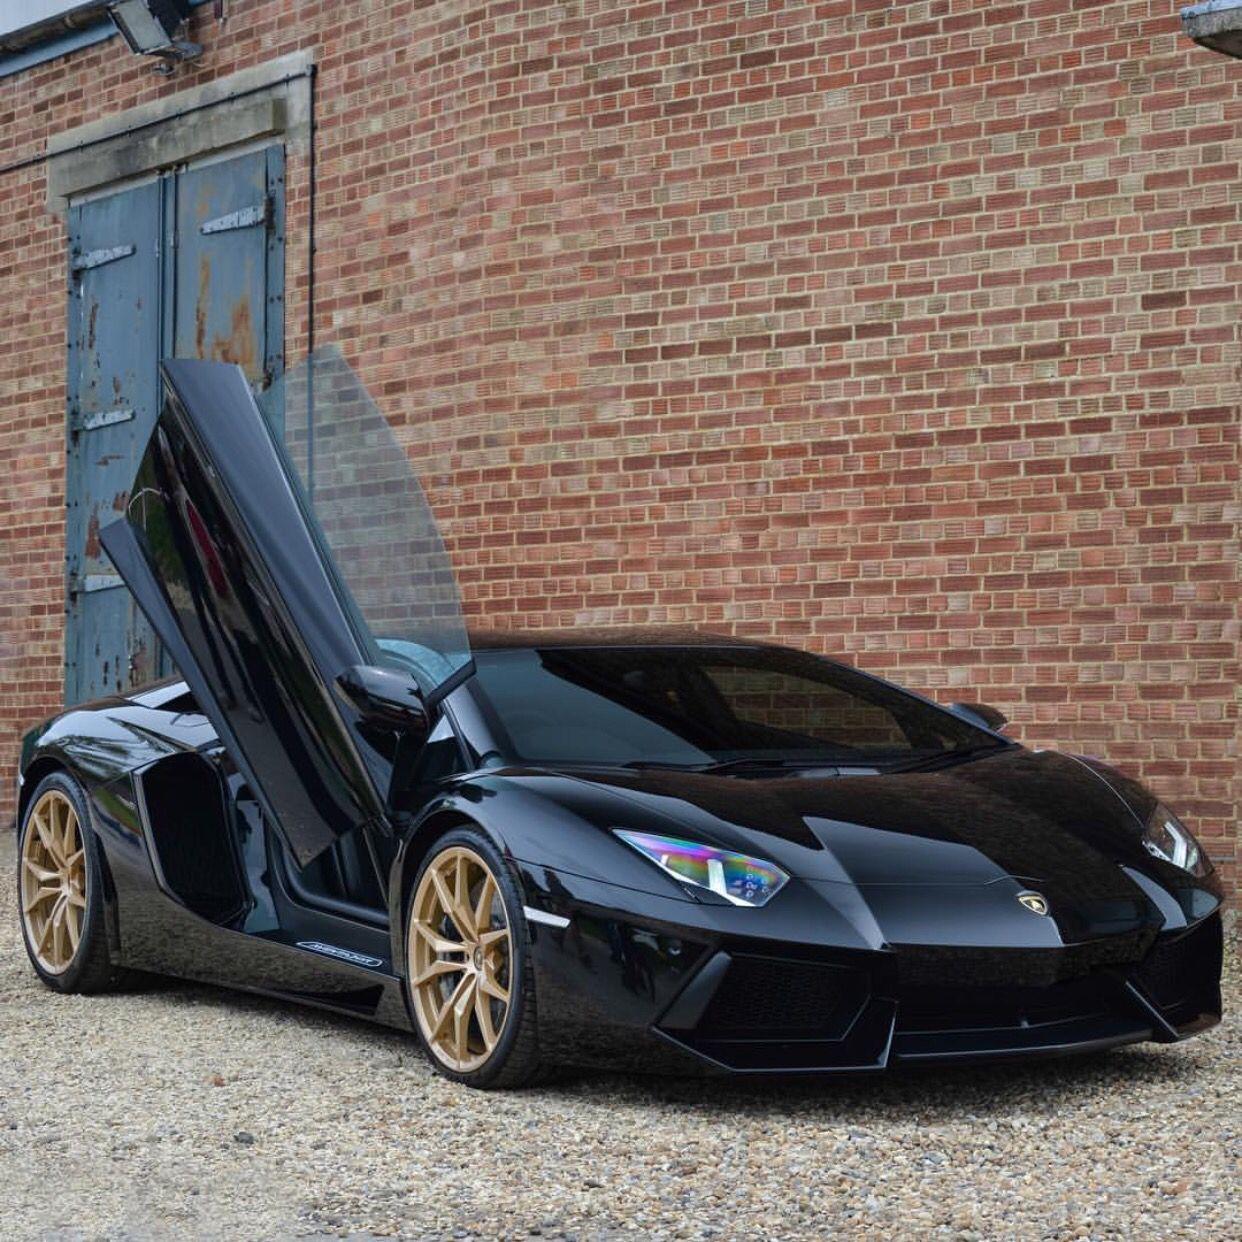 Lamborghini Aventador Coupe painted in Nero Aldebaran w/ Gold Dione on gold mercedes, gold lamborghini convertible, gold rolls-royce phantom, gold lamborghini countach, gold lamborghini diablo, gold camaro, gold aston martin, gold lamborghini reventon, gold bentley, gold lamborghini gallardo, gold bmw, gold honda accord, gold toyota camry, gold and diamond lamborghini, gold koenigsegg agera r, gold ferrari, gold bugatti, gold lamborghini elemento, gold lamborghini egoista, gold lamborghini murcielago,